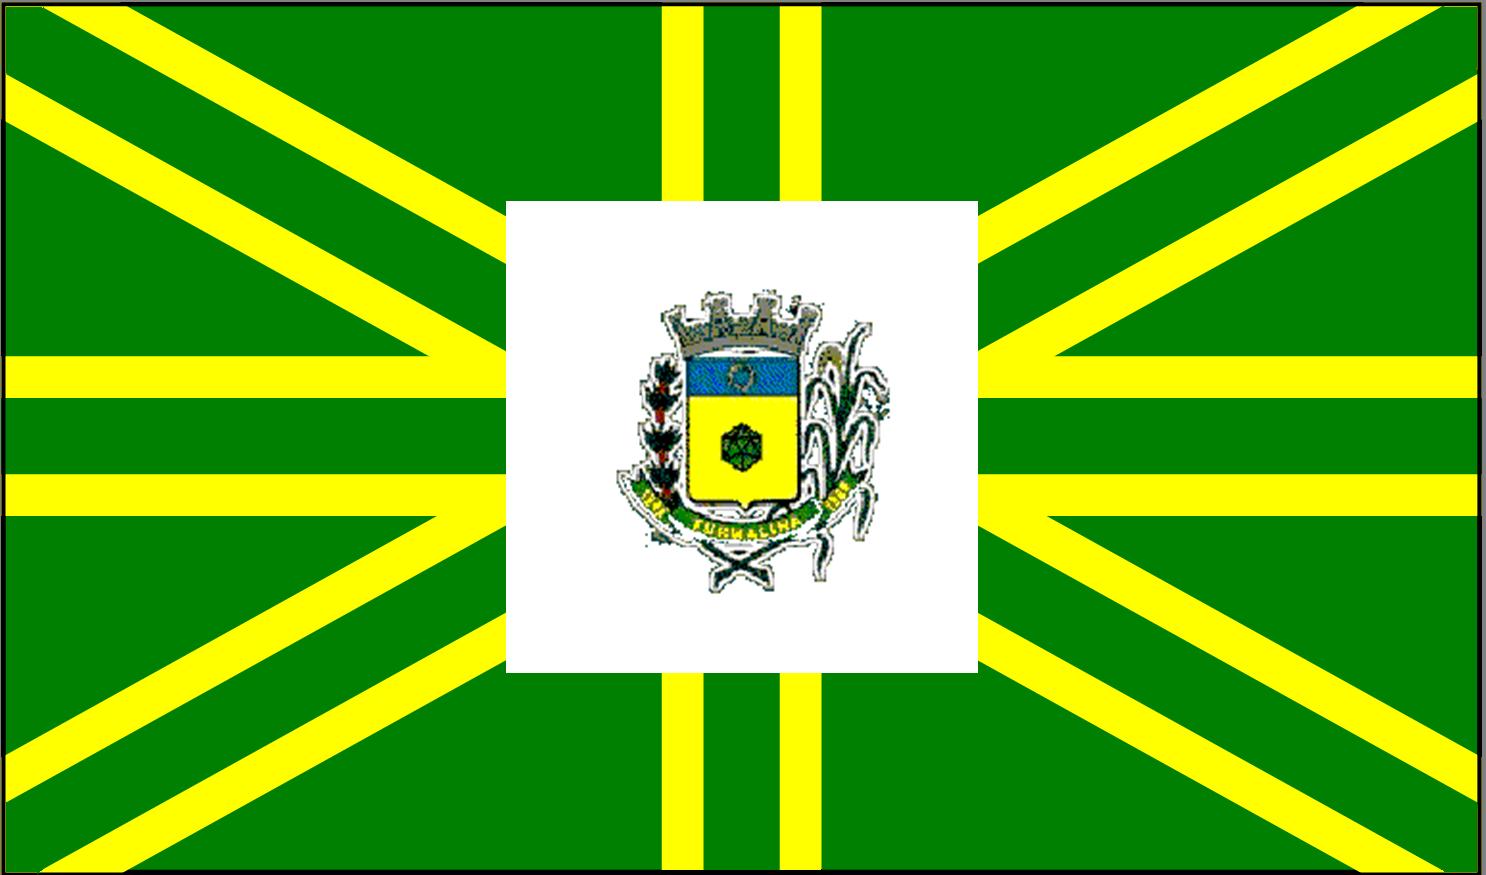 Turmalina São Paulo fonte: upload.wikimedia.org